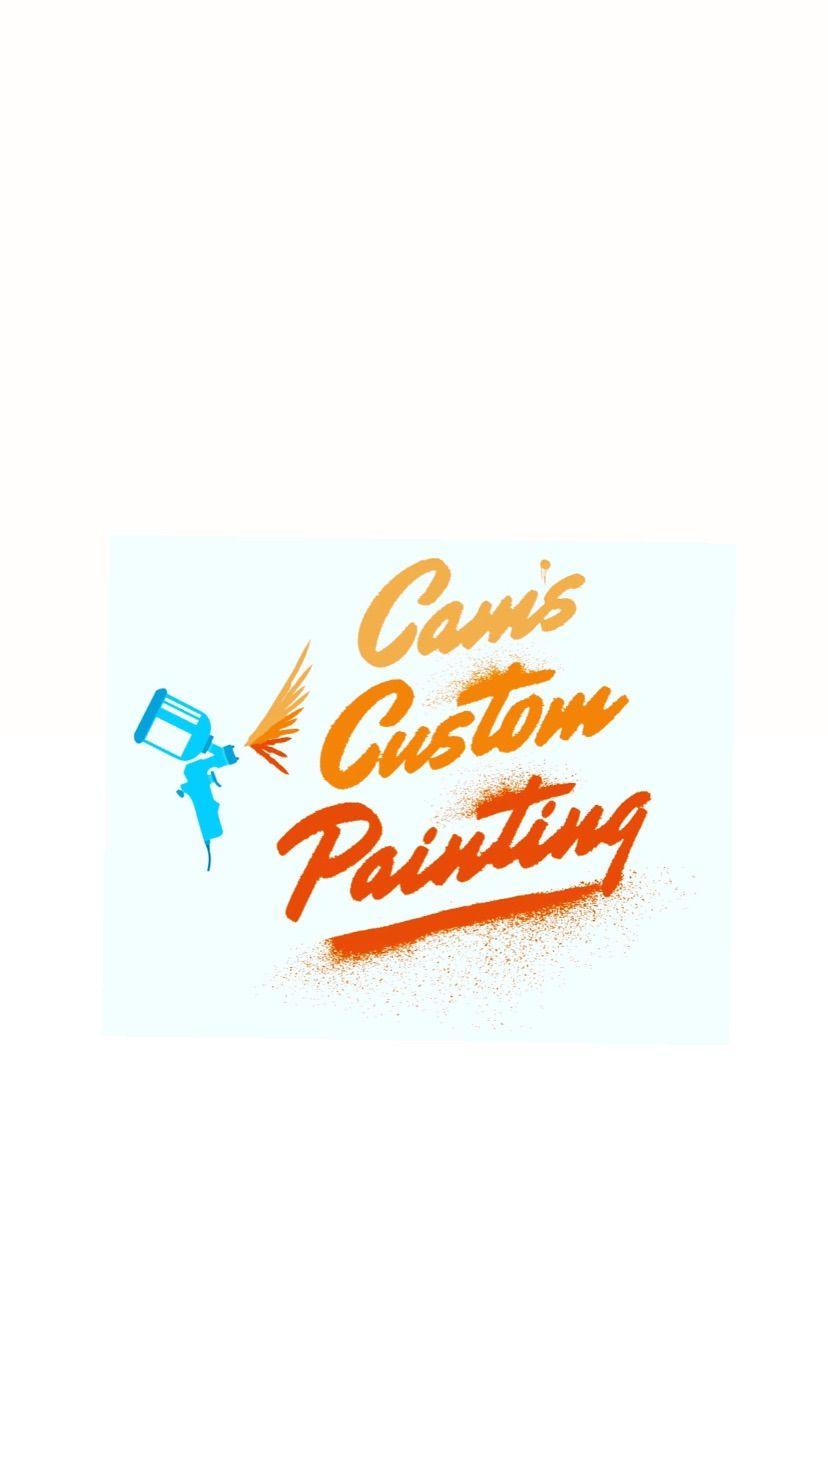 Cams Custom Painting, LLC